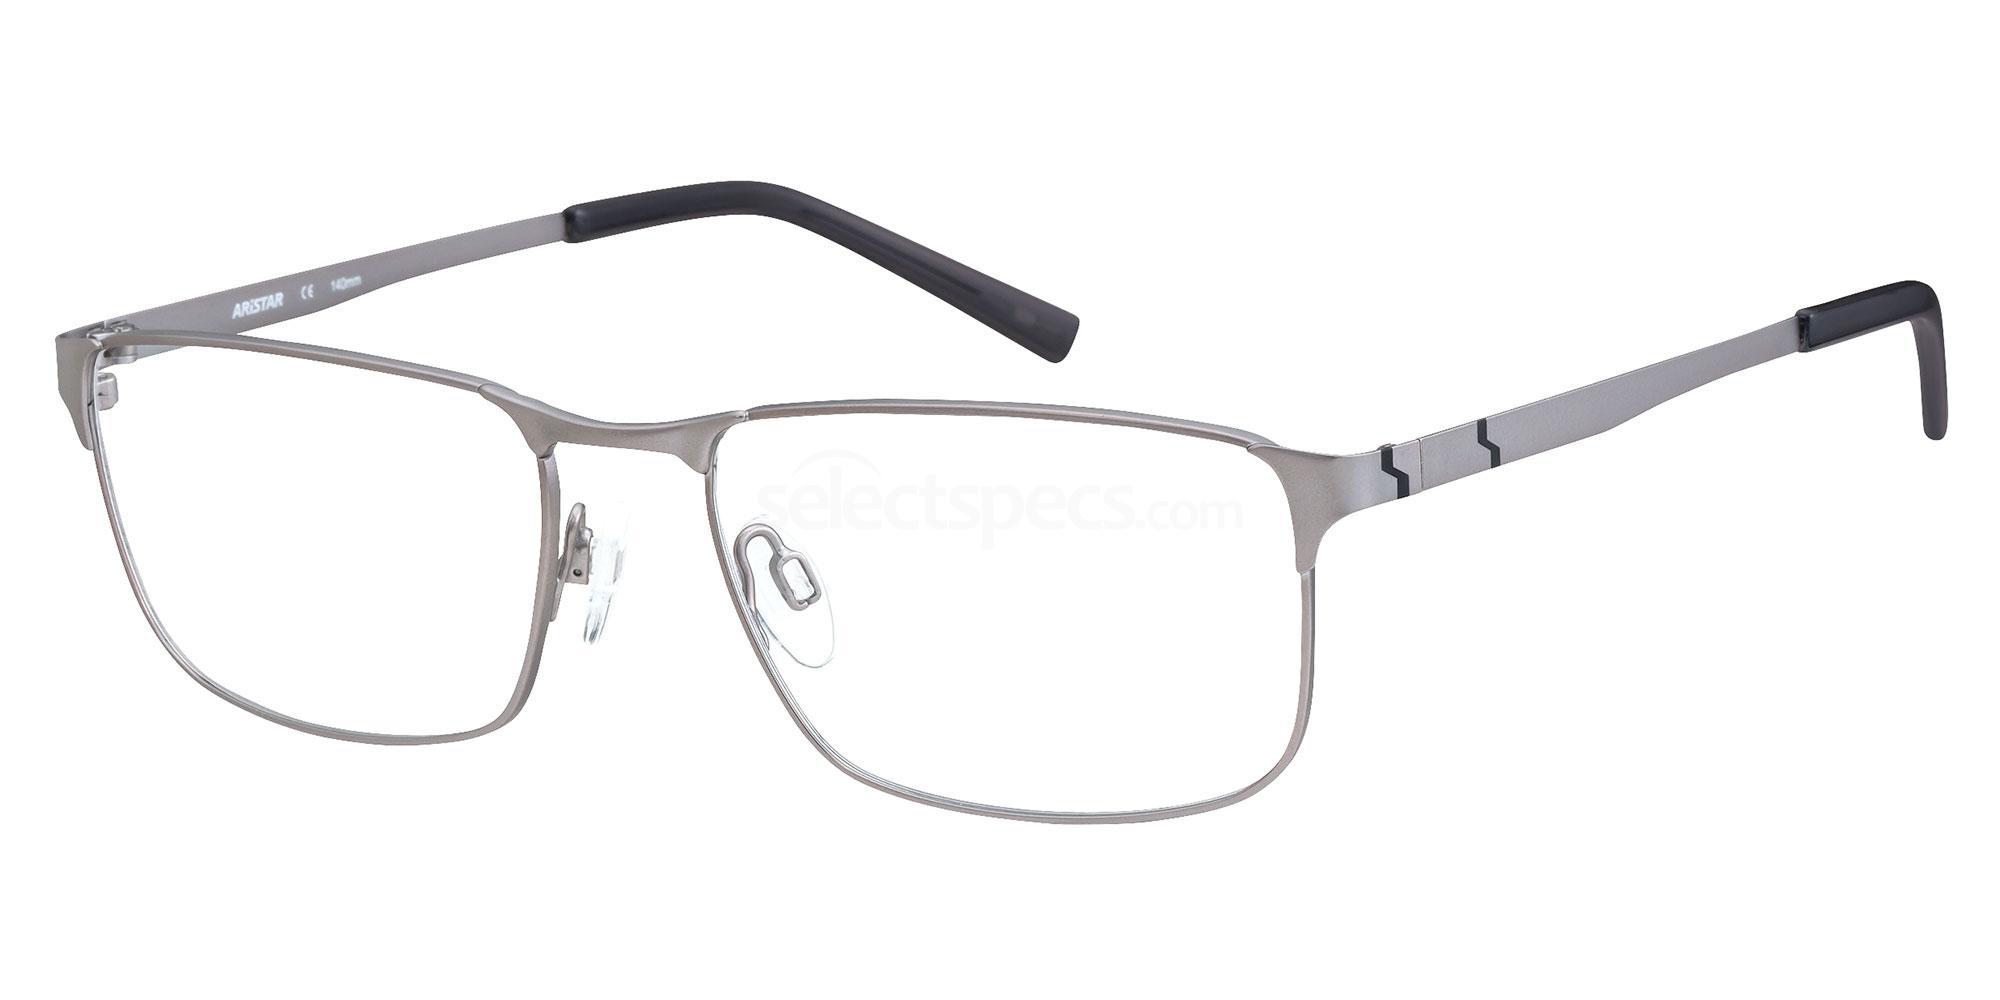 505 AR16270 Glasses, Aristar